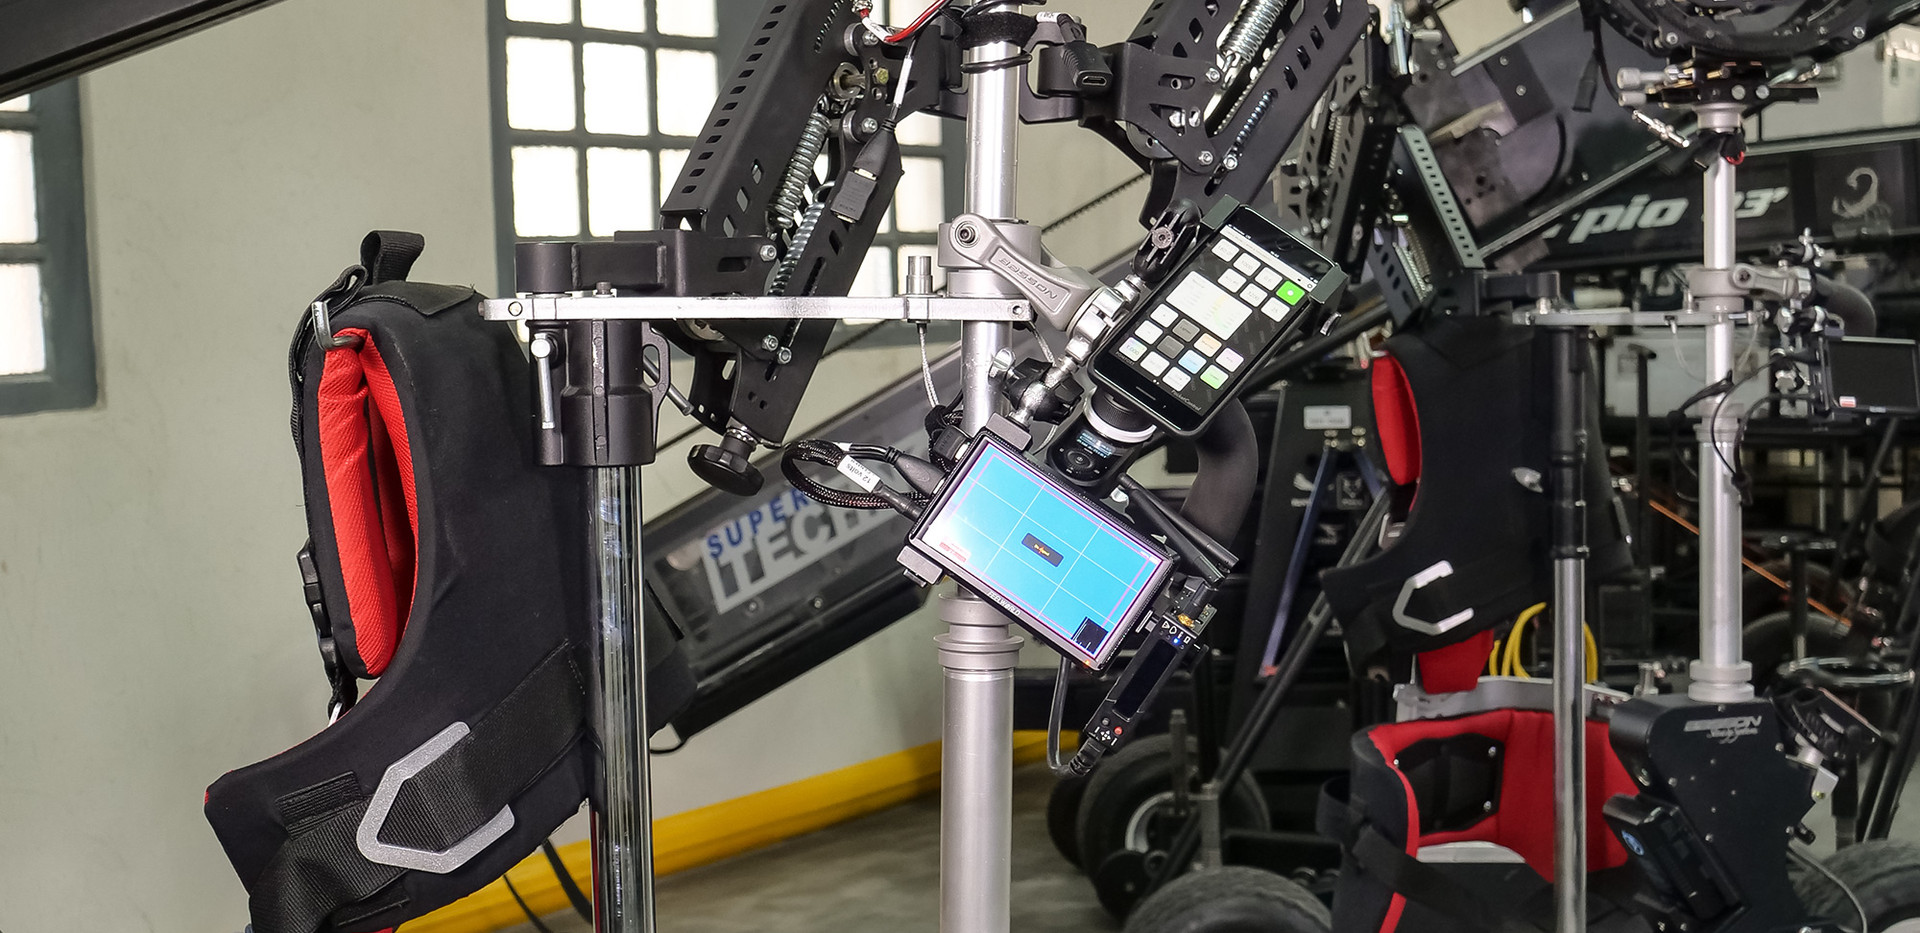 Hybrid Steadycam with Arri alexa mini plus hybrid steadycam Endless 3 Basson Steady camera stabilizer